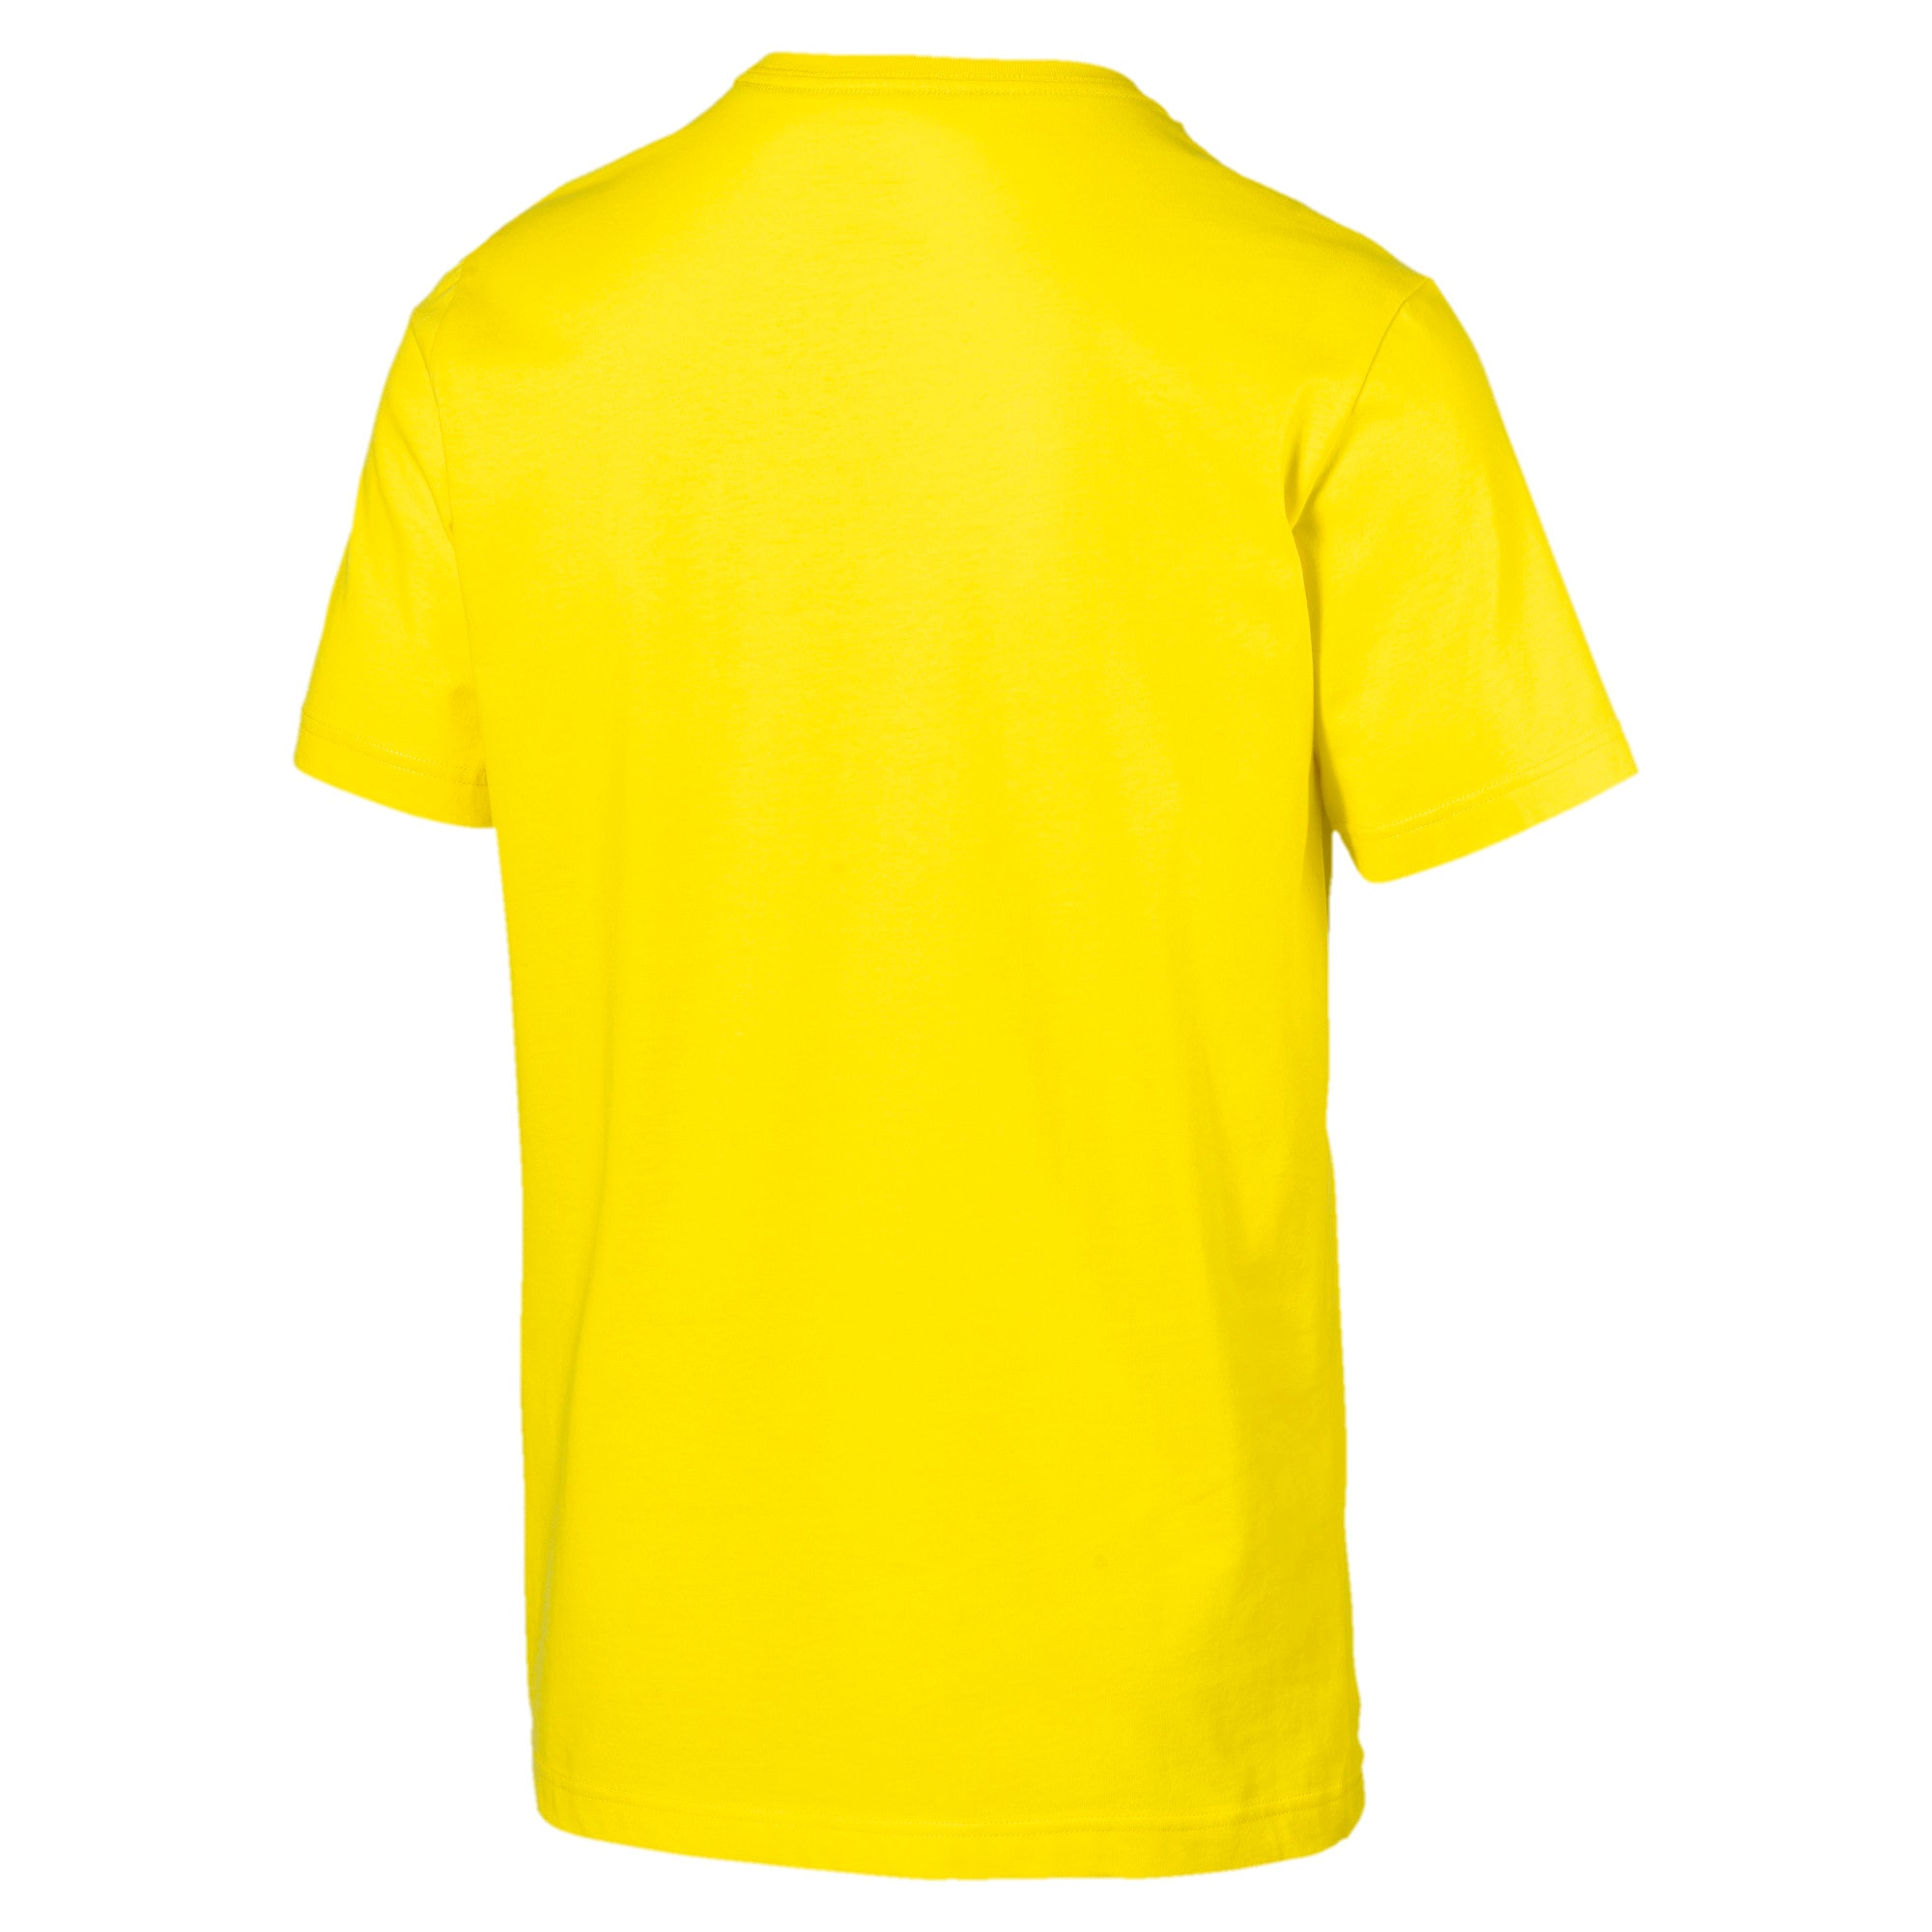 Thumbnail 5 of T-shirt Essentials uomo, Blazing Yellow, medium